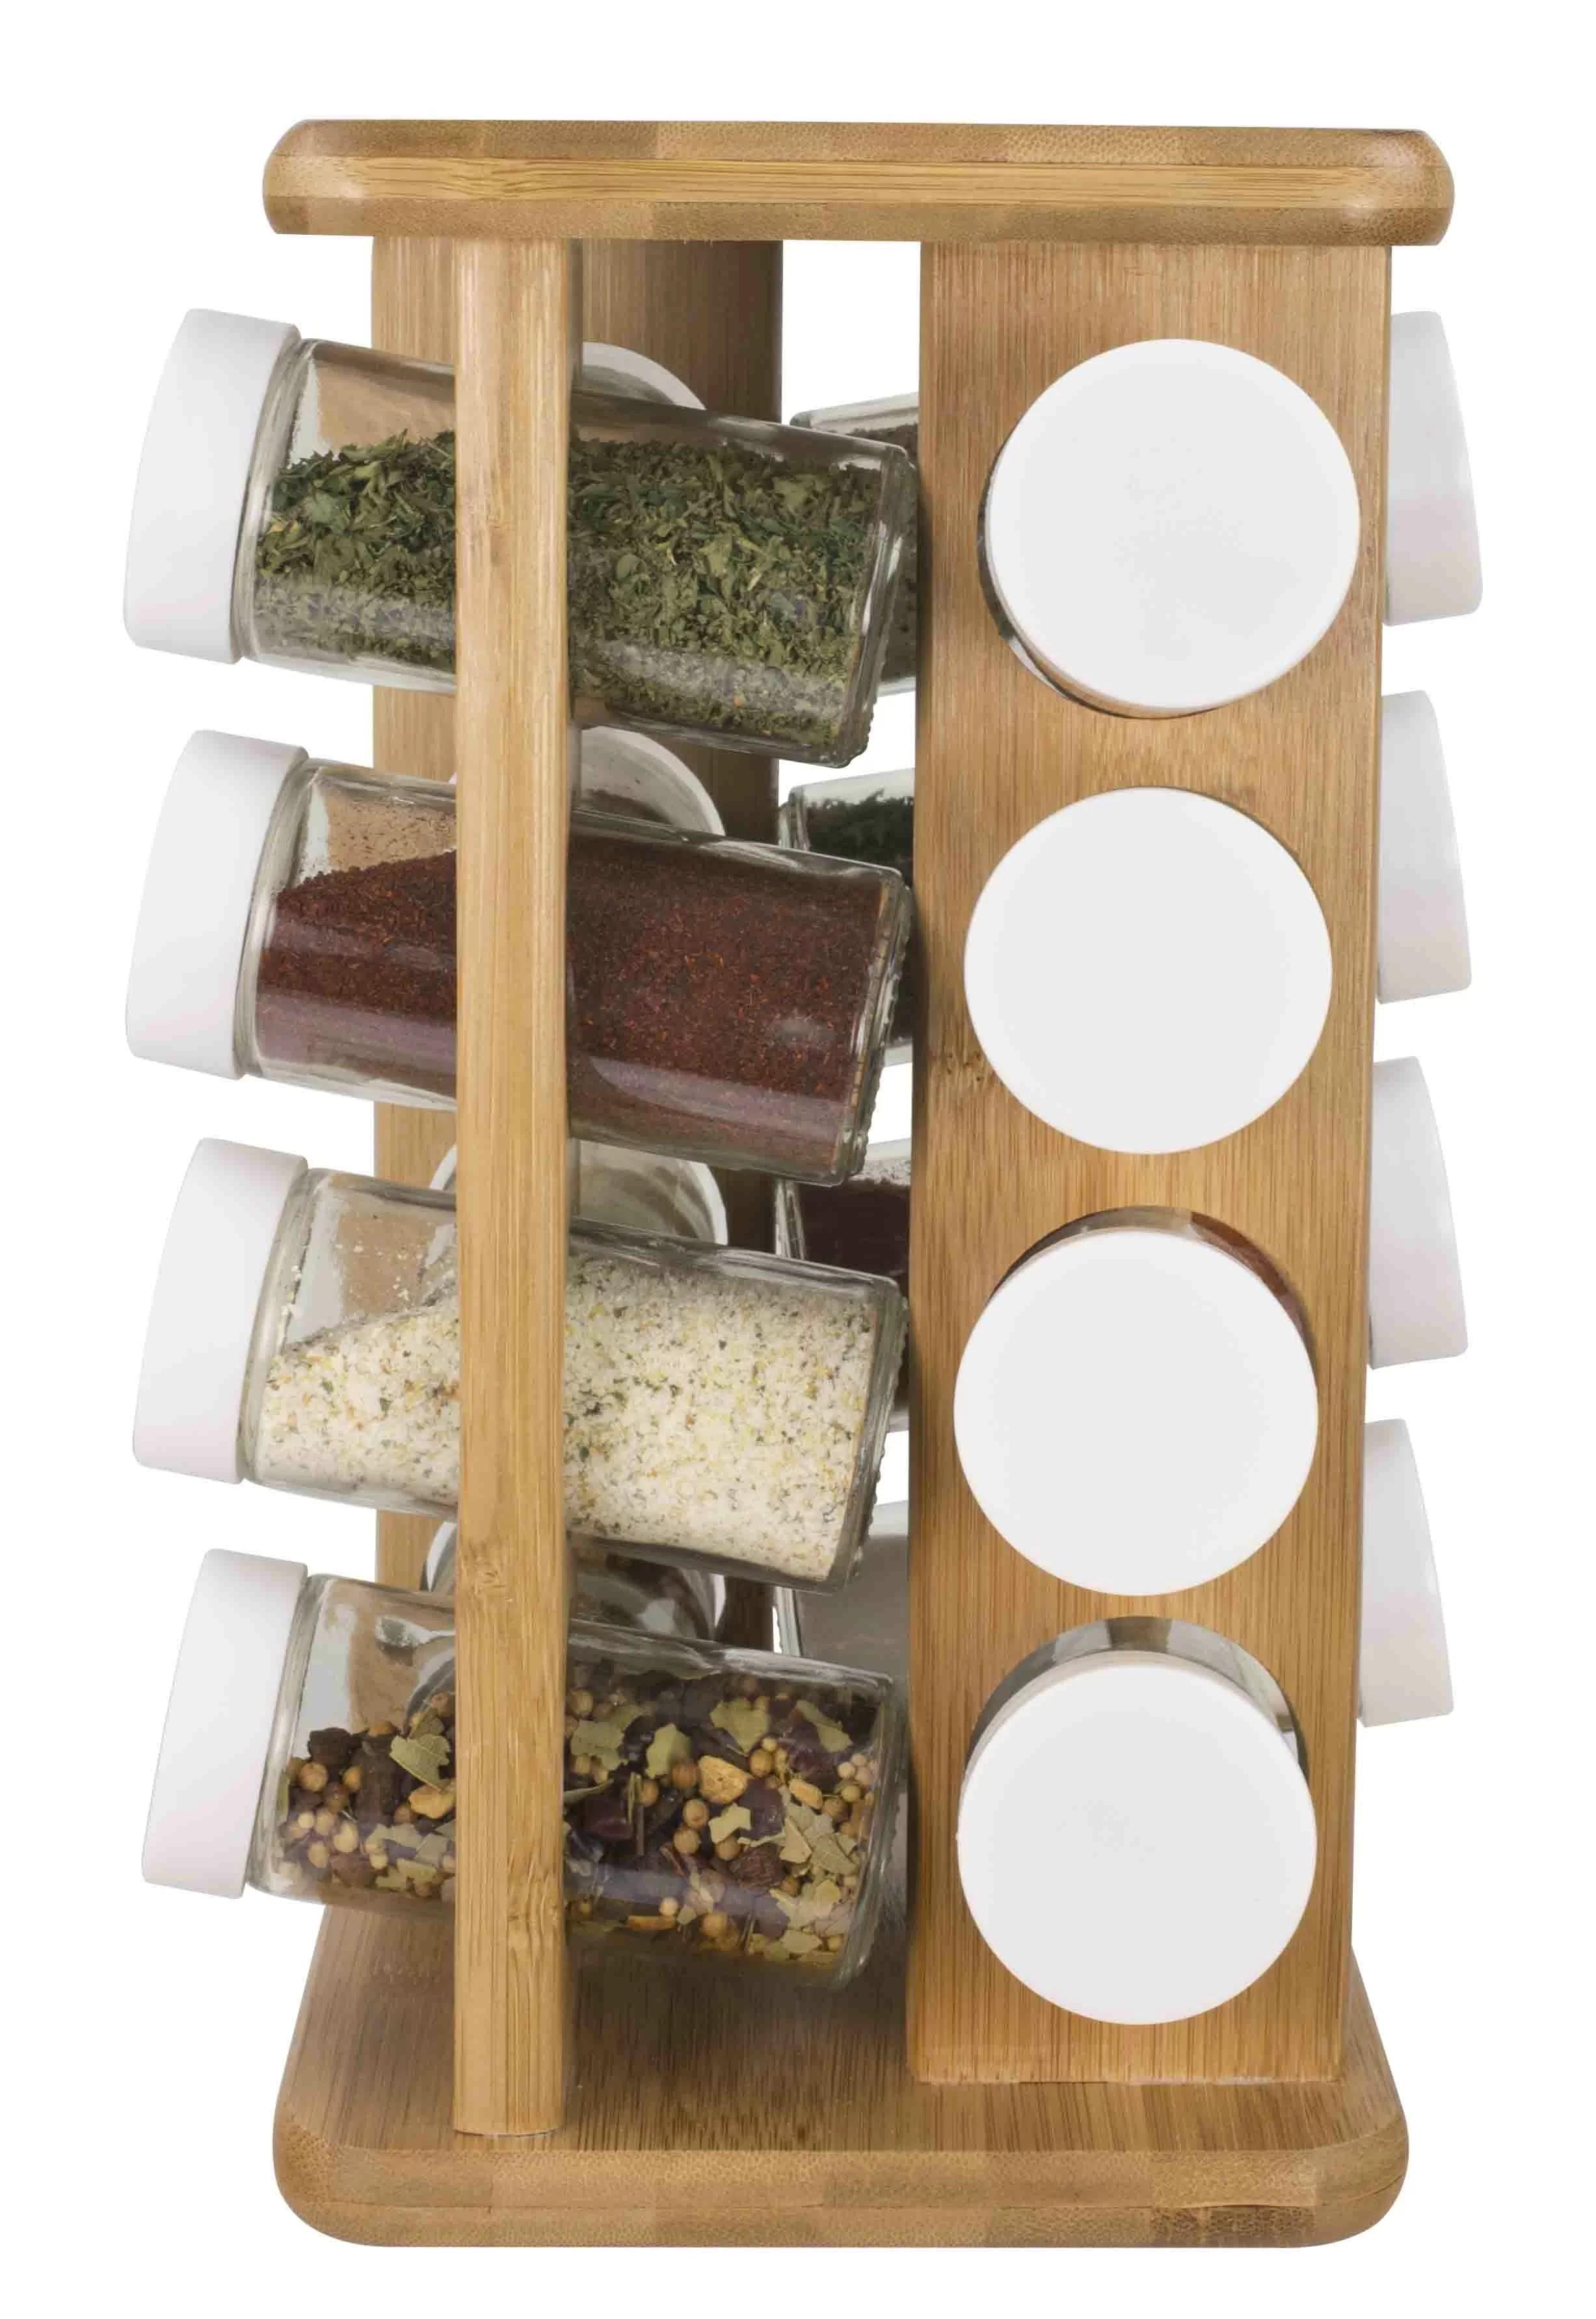 16 spice jar rack set